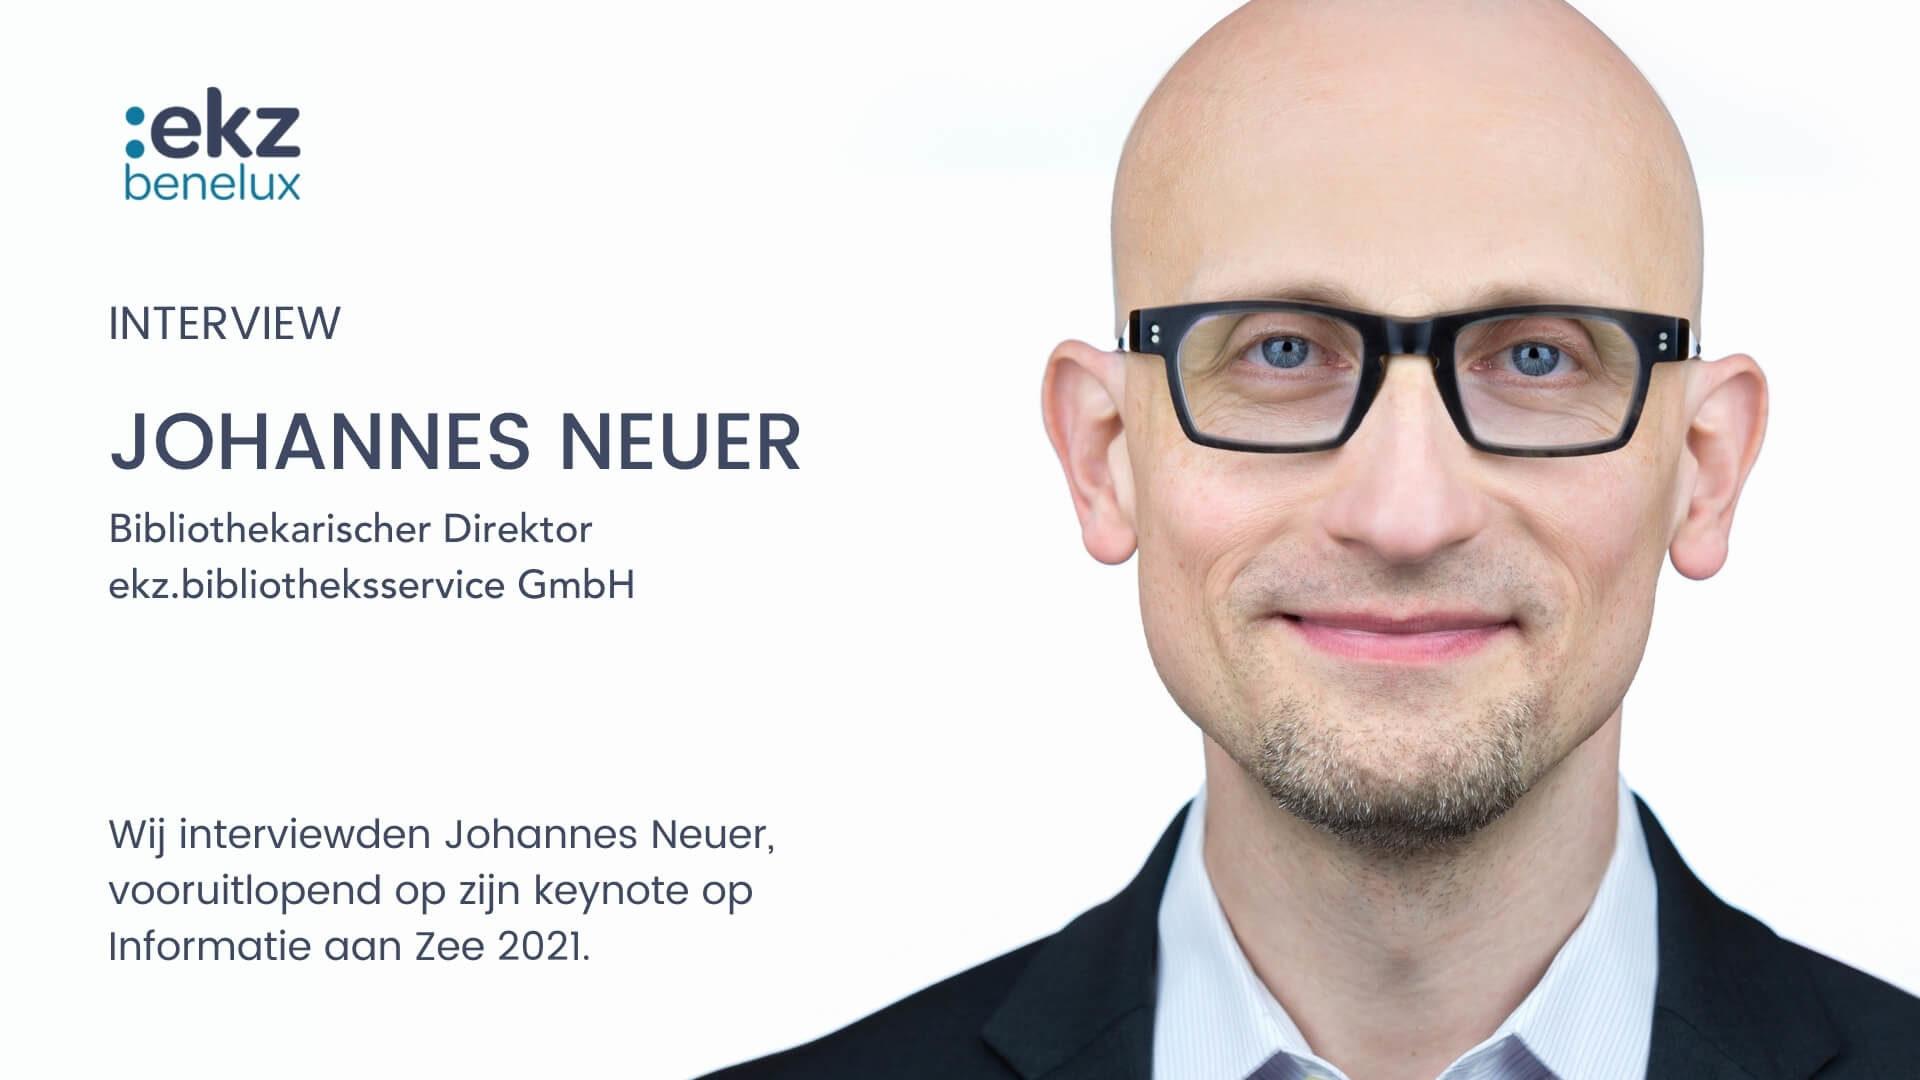 ekz benelux interviewt Johannes Neuer